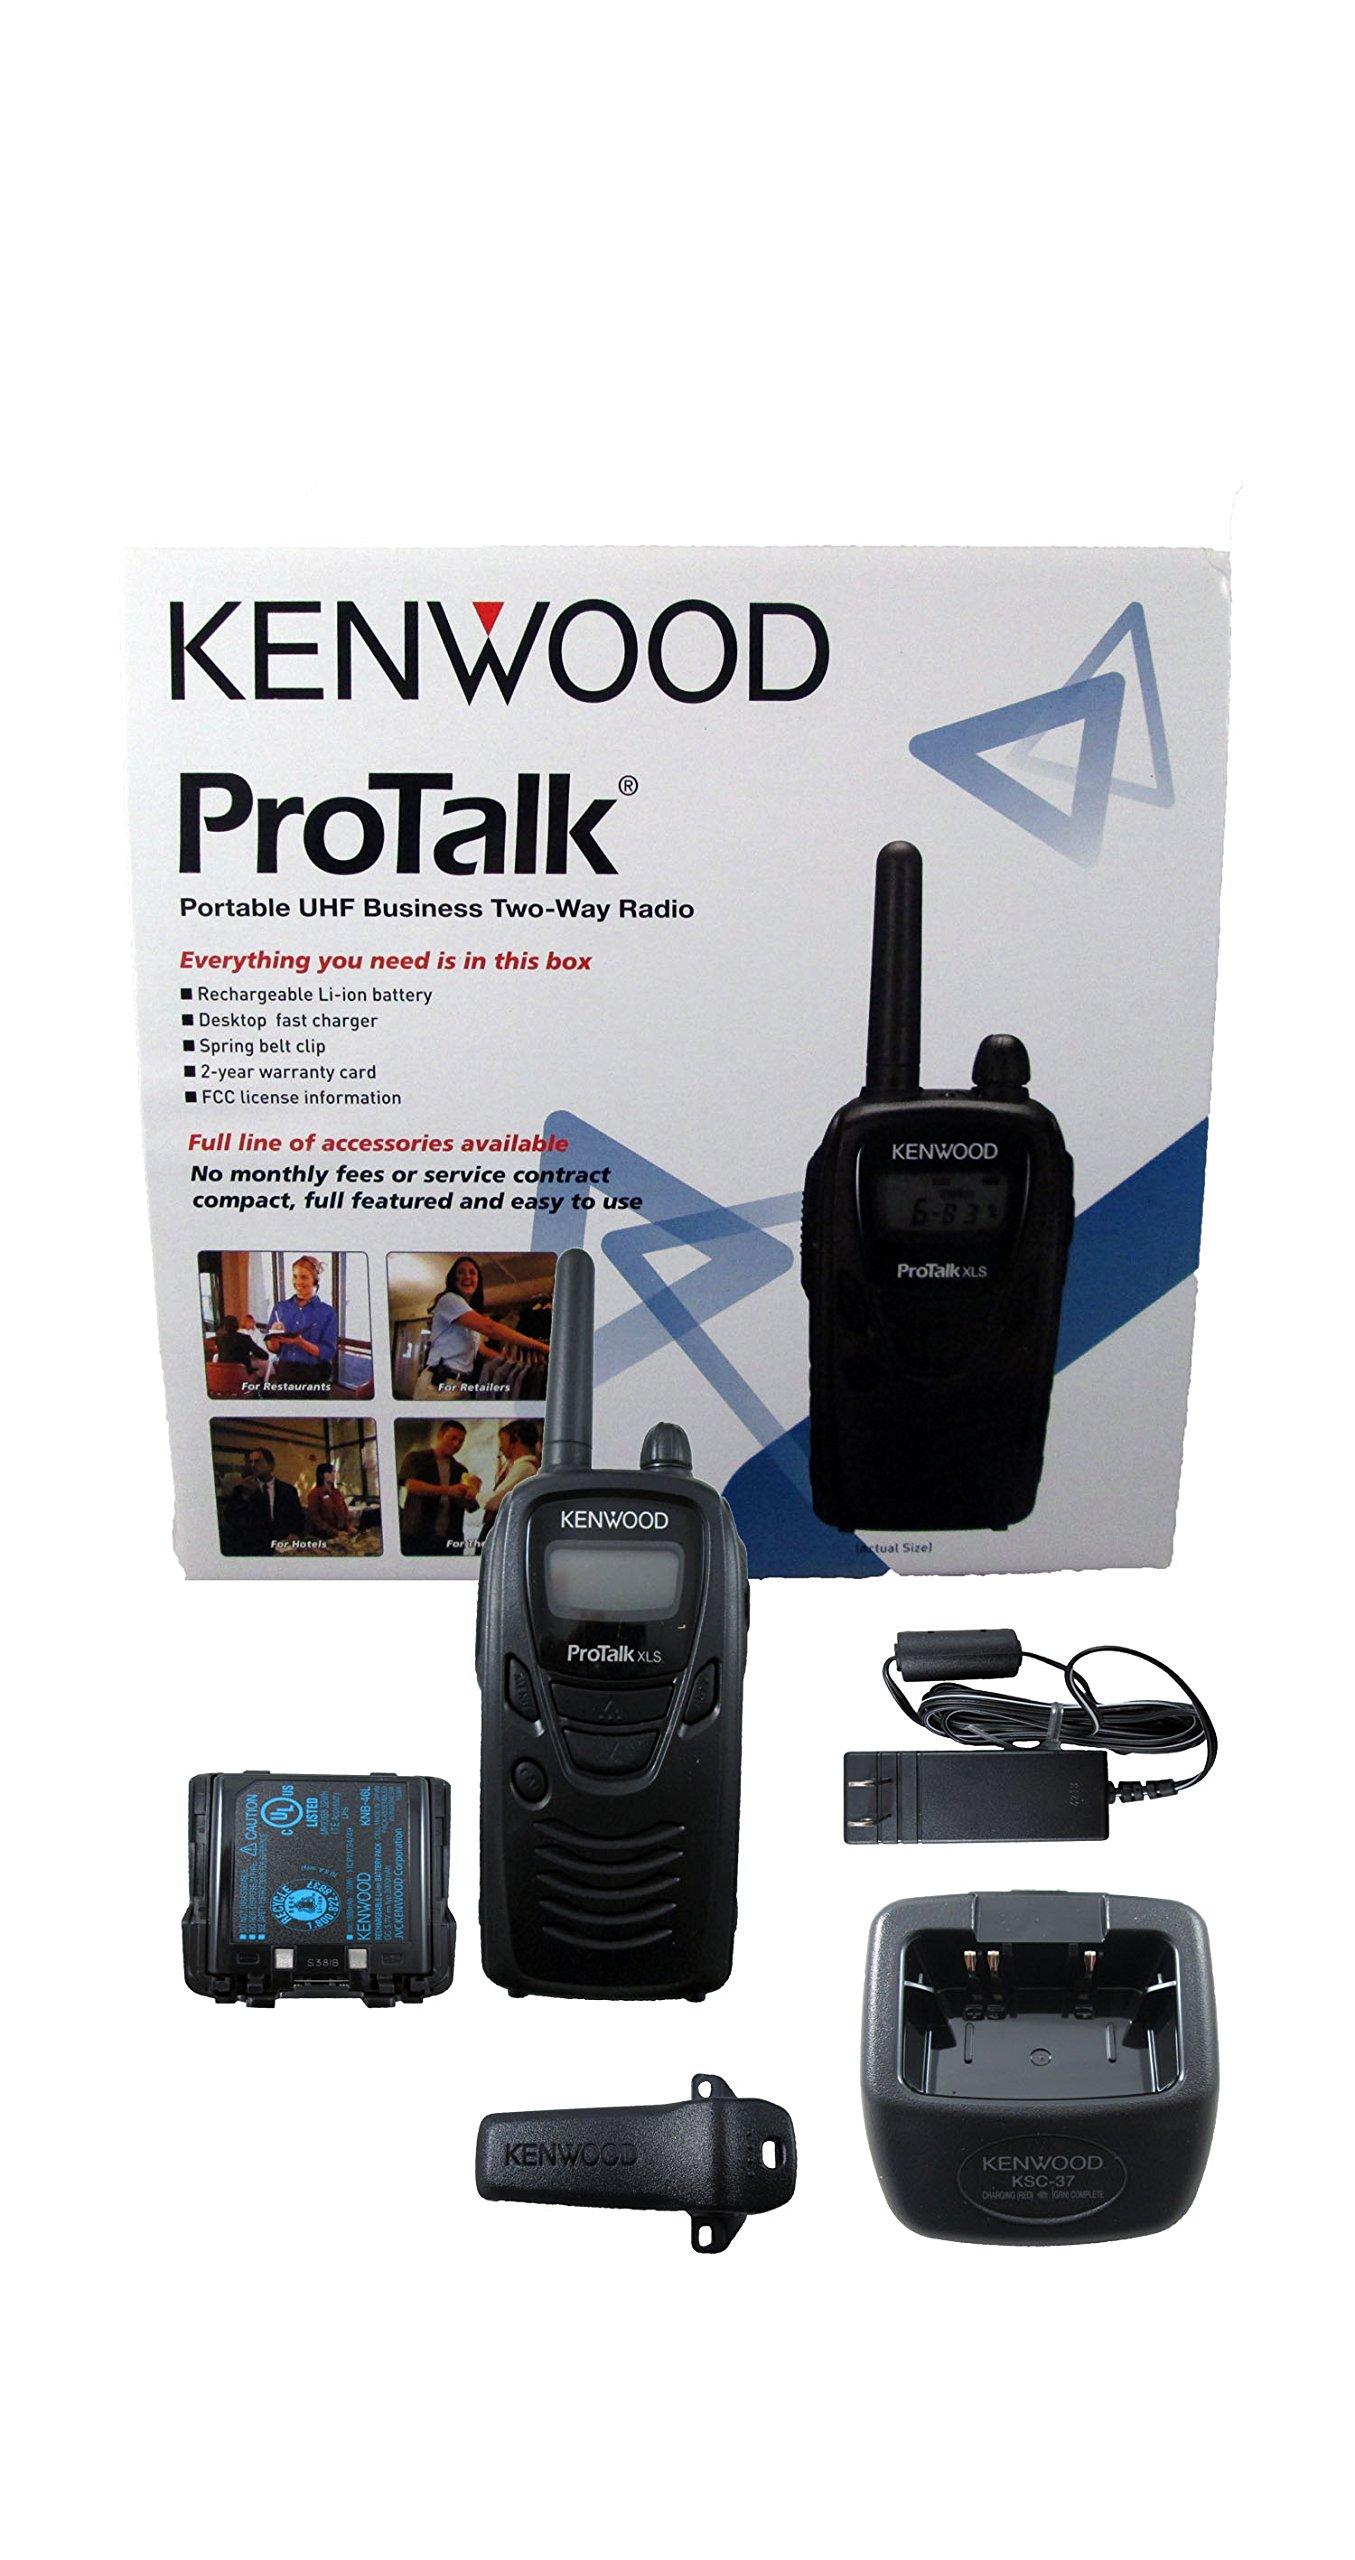 Kenwood TK-3230 ProTalk XLS Portable UHF Business Two-Way Radio, 1.5 Watts Transmit Power, 6 Channels, FleetSync, Black